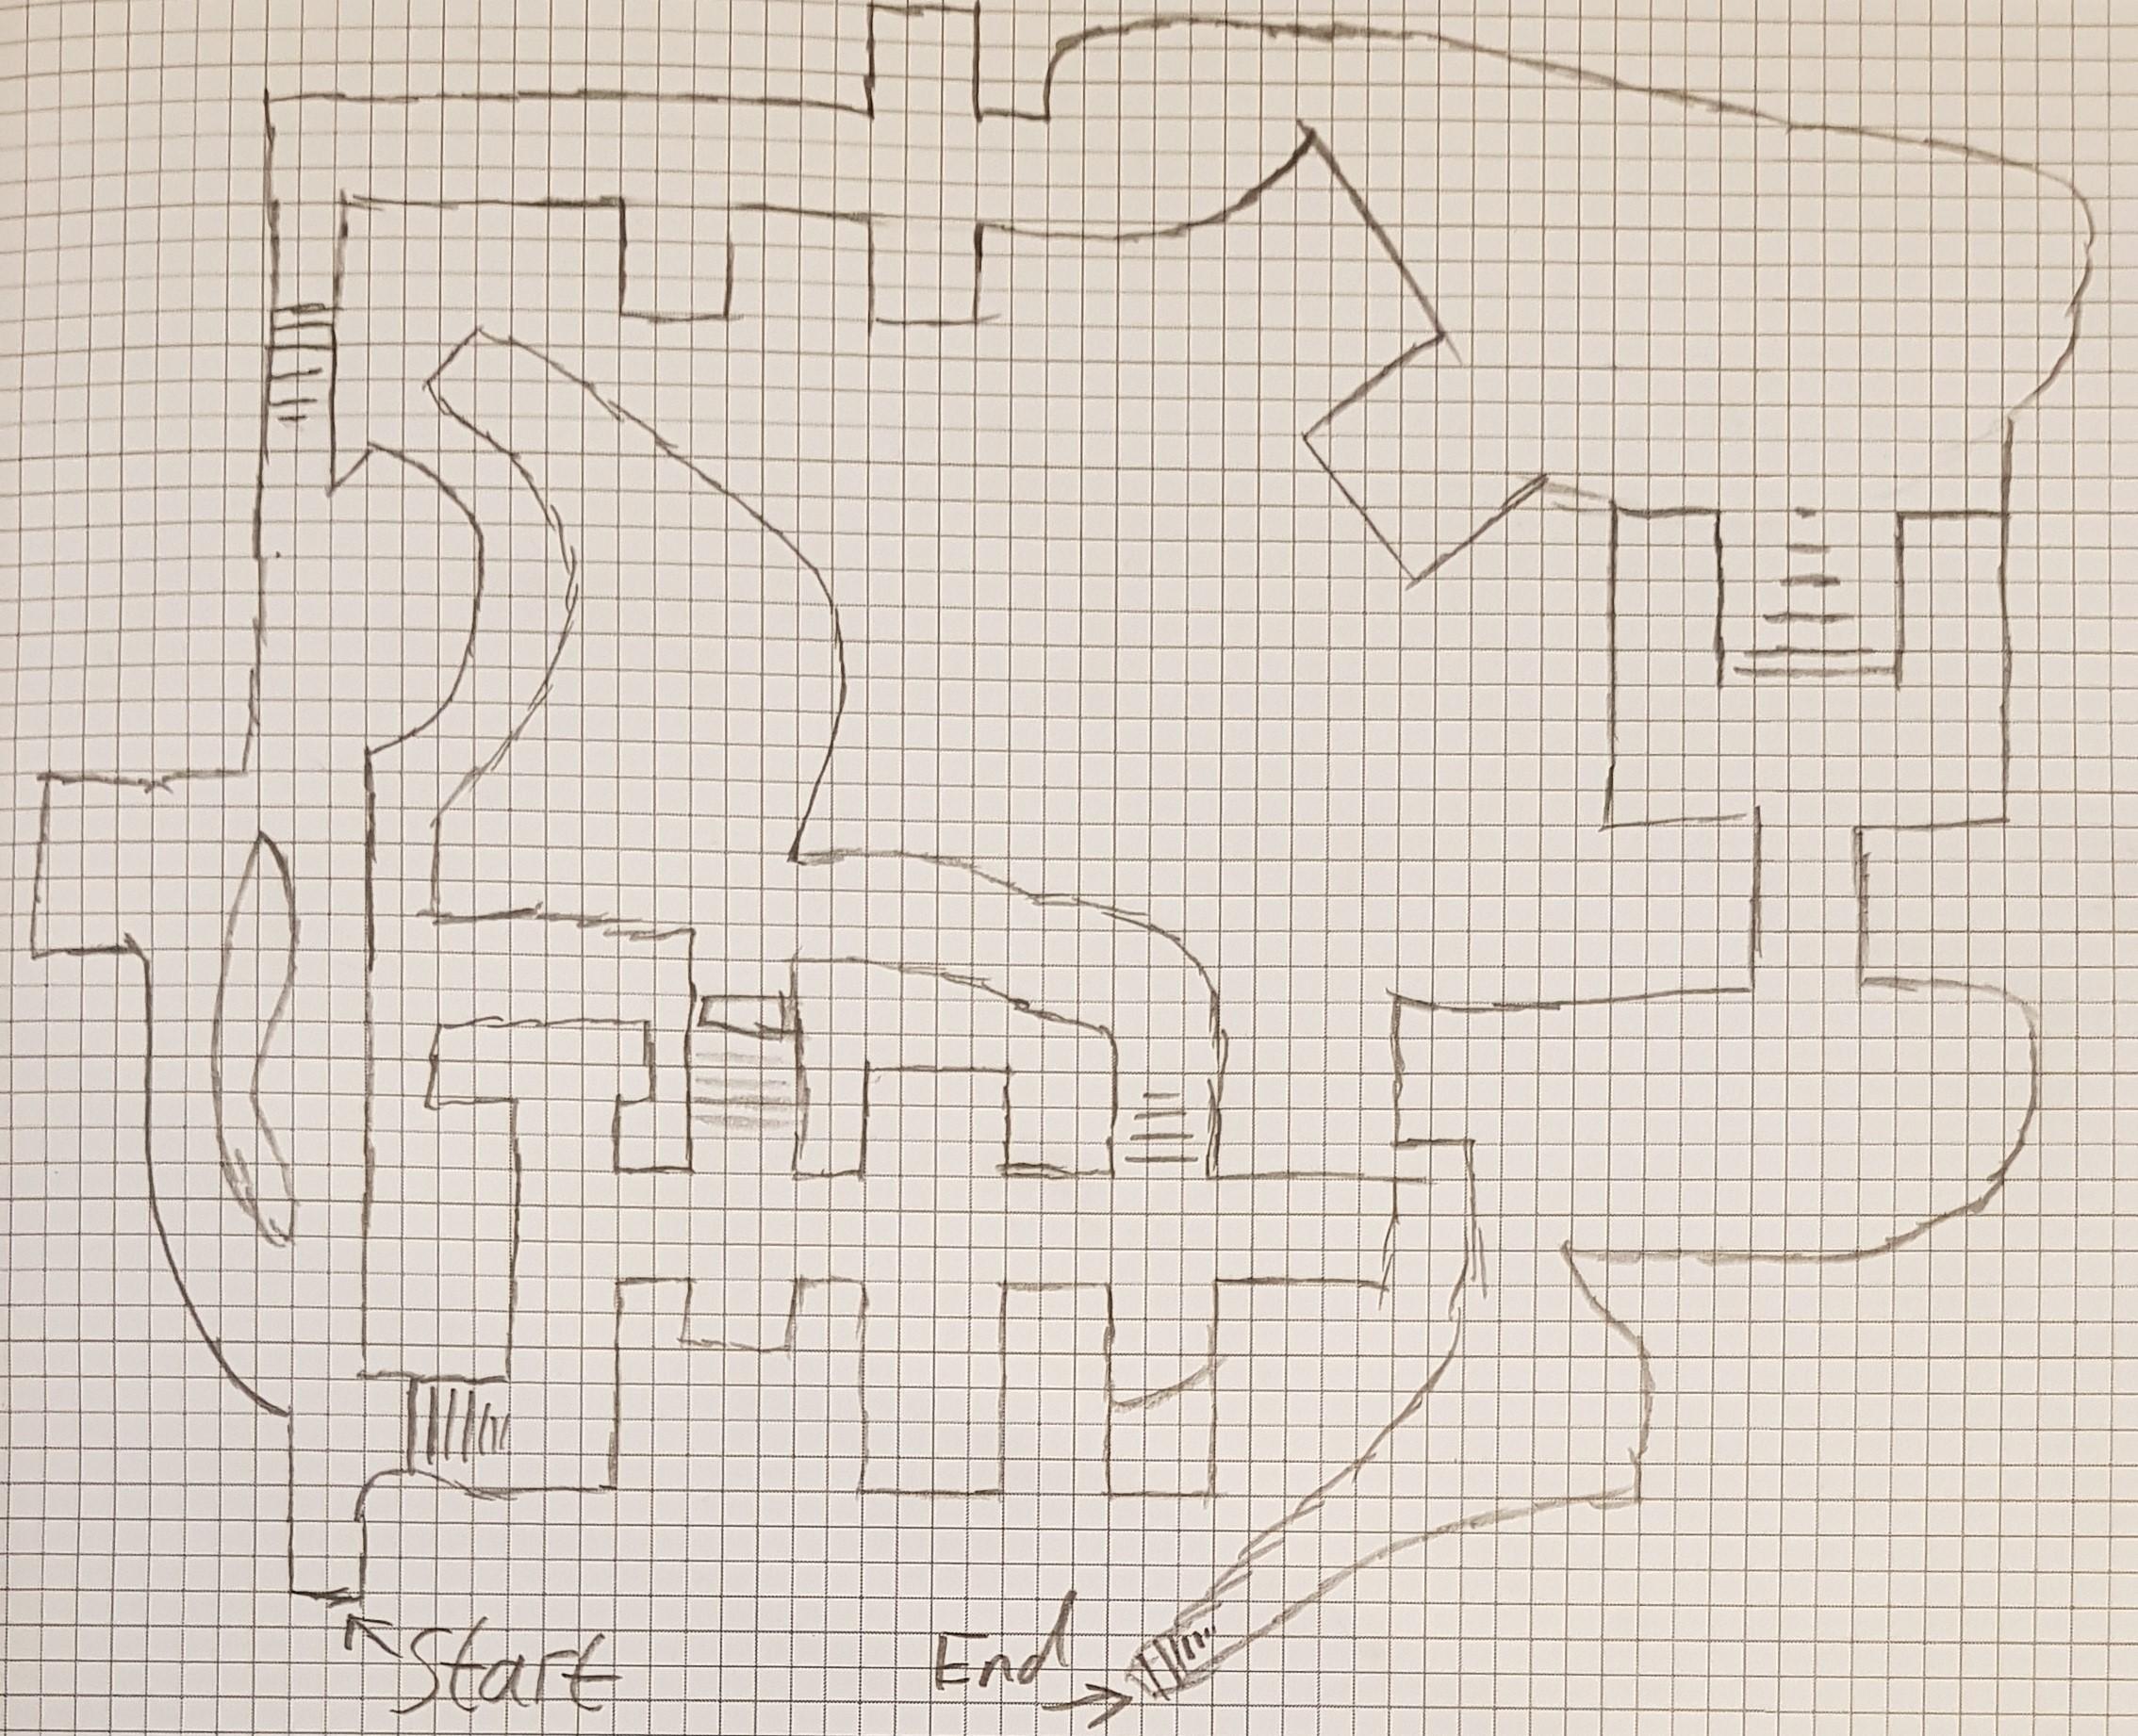 Underground Tomb Level Sketch